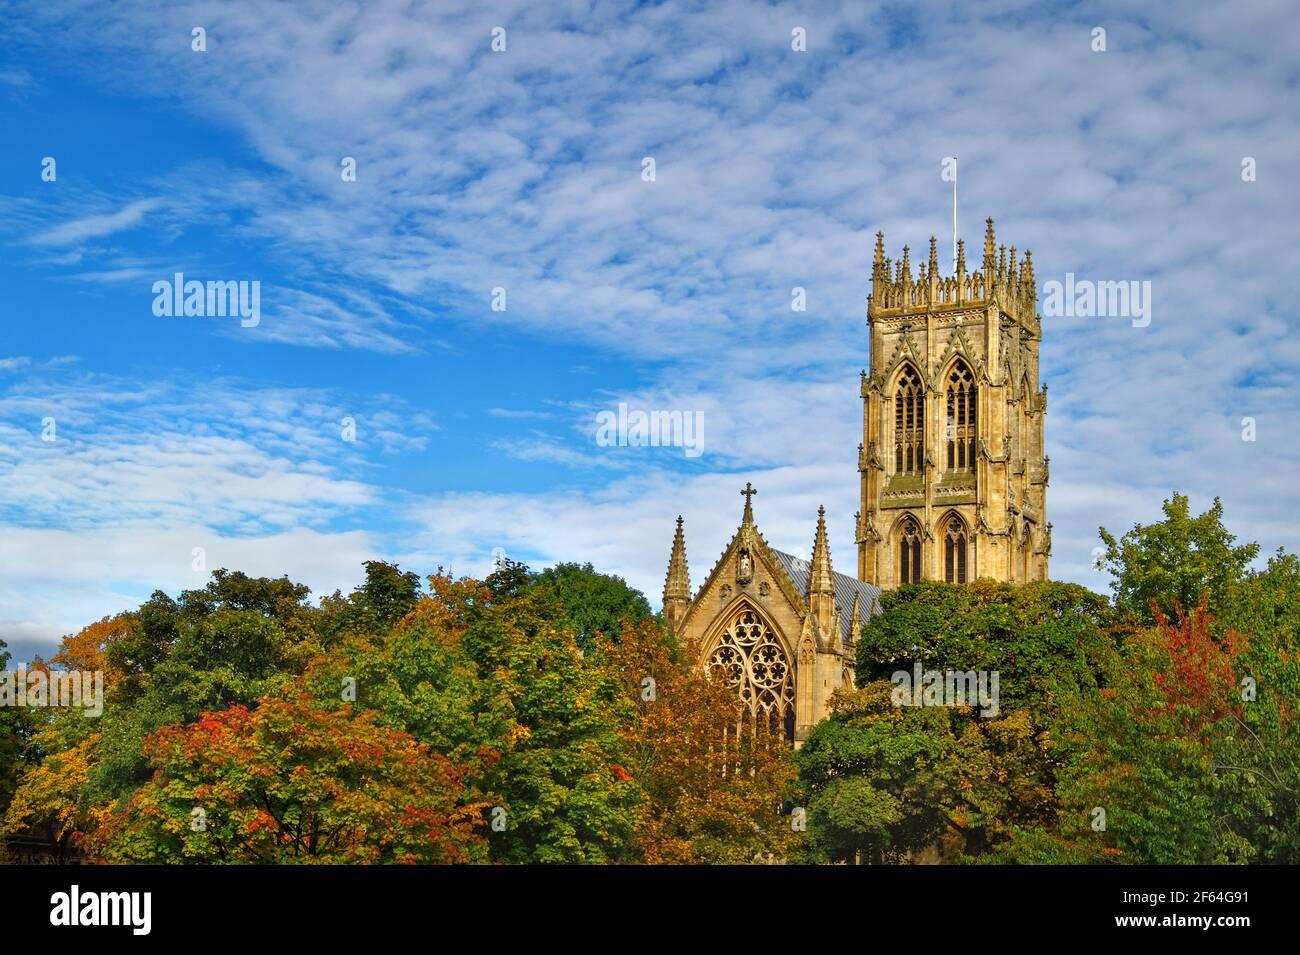 UK,South Yorkshire,Doncaster,St George's Church Banque D'Images